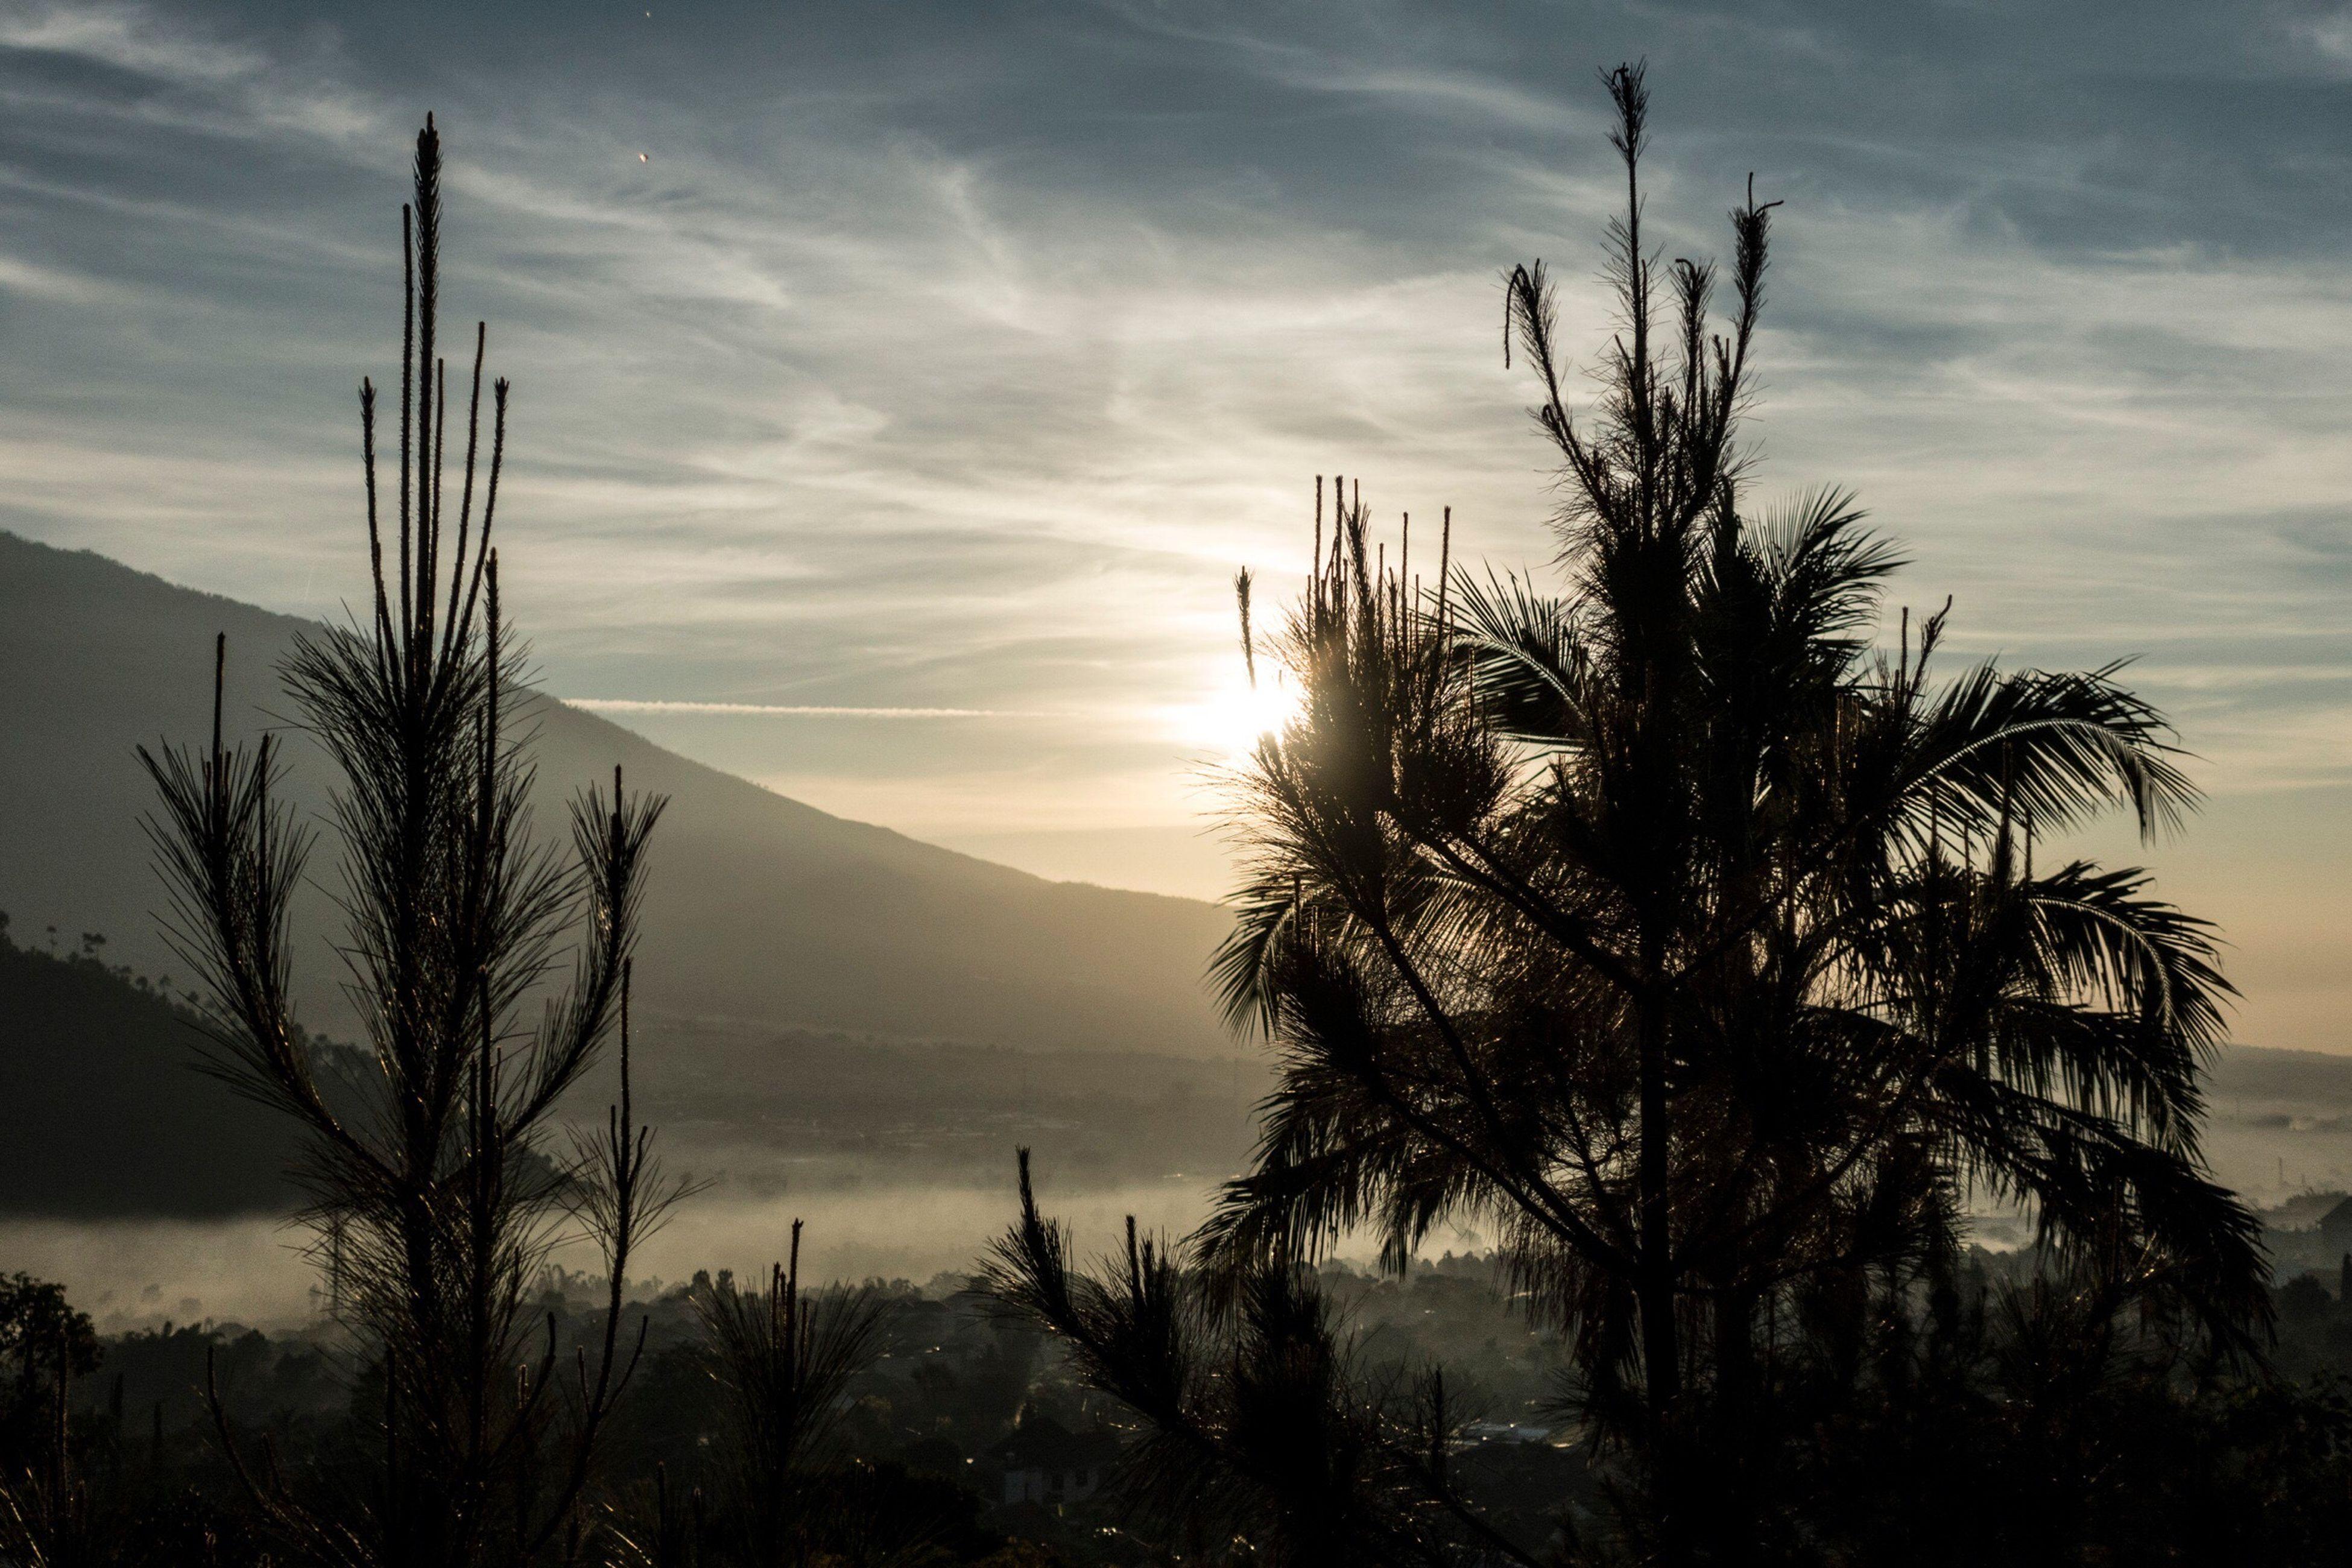 tranquil scene, tranquility, sky, scenics, mountain, beauty in nature, sunset, silhouette, nature, cloud - sky, mountain range, tree, landscape, cloud, sun, idyllic, growth, non-urban scene, plant, outdoors